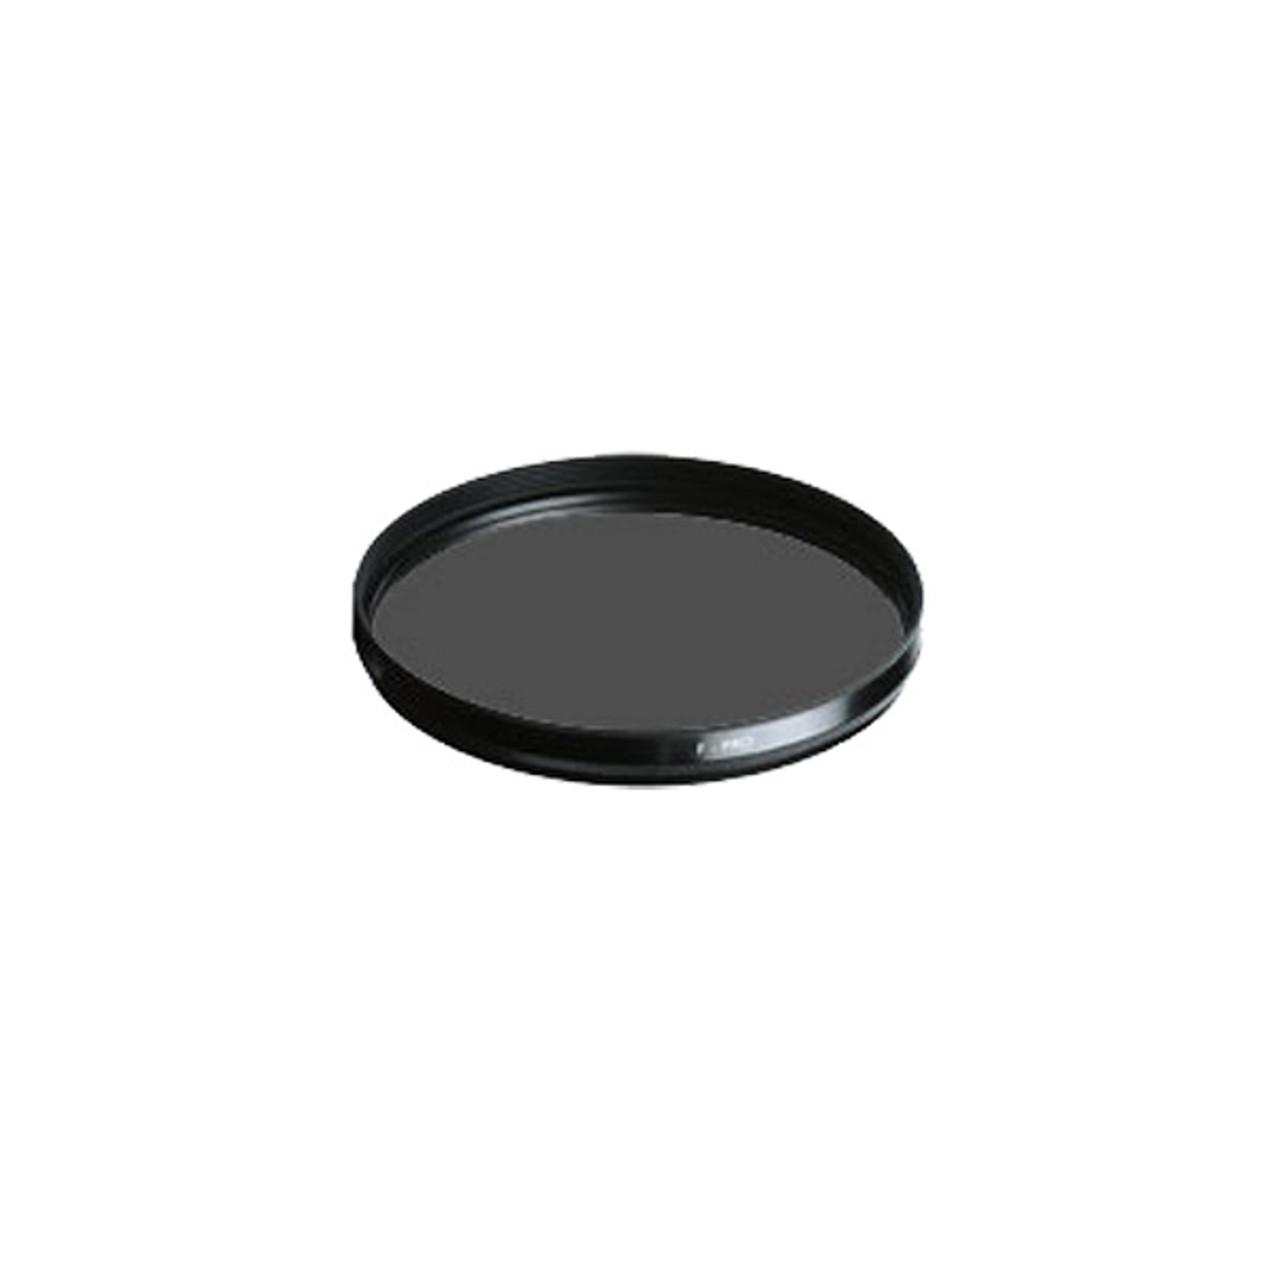 B+W 77mm F-Pro 110 ND 3.0 MRC Filter